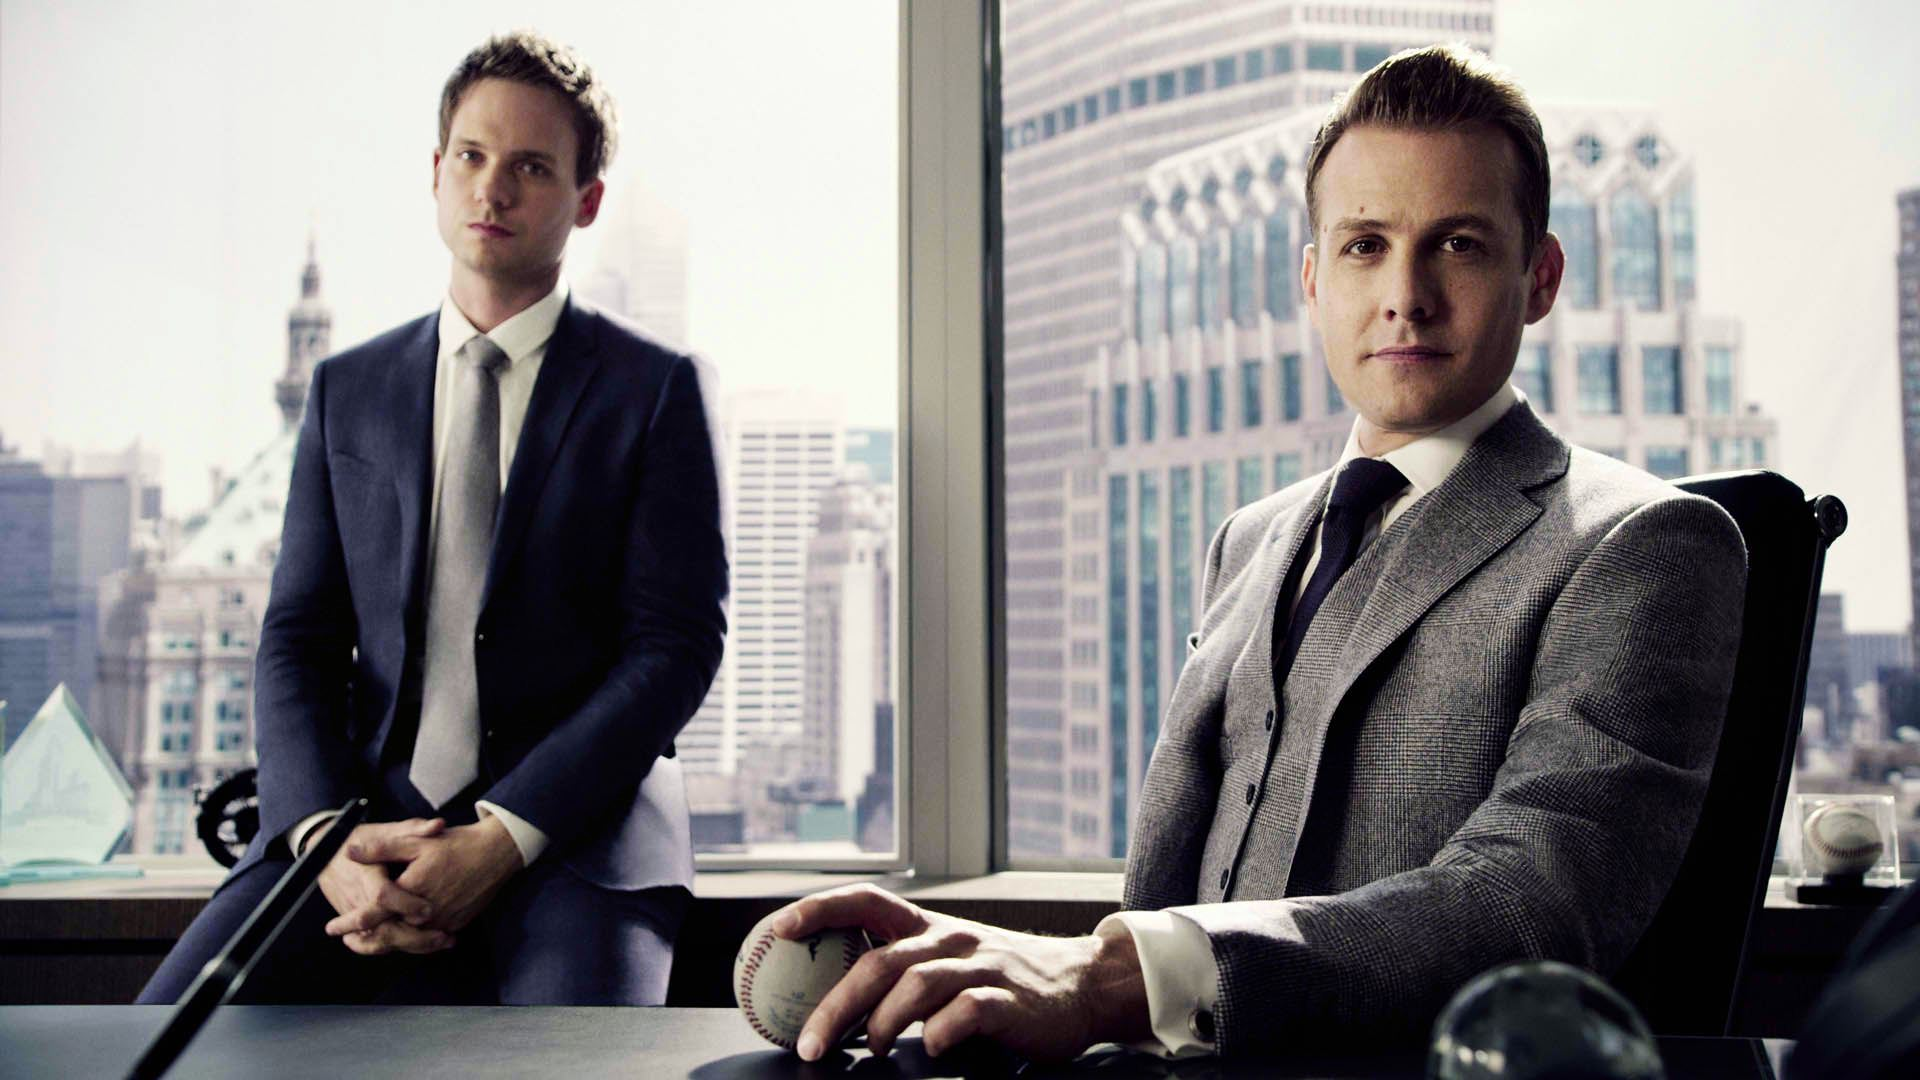 Suits Wallpaper